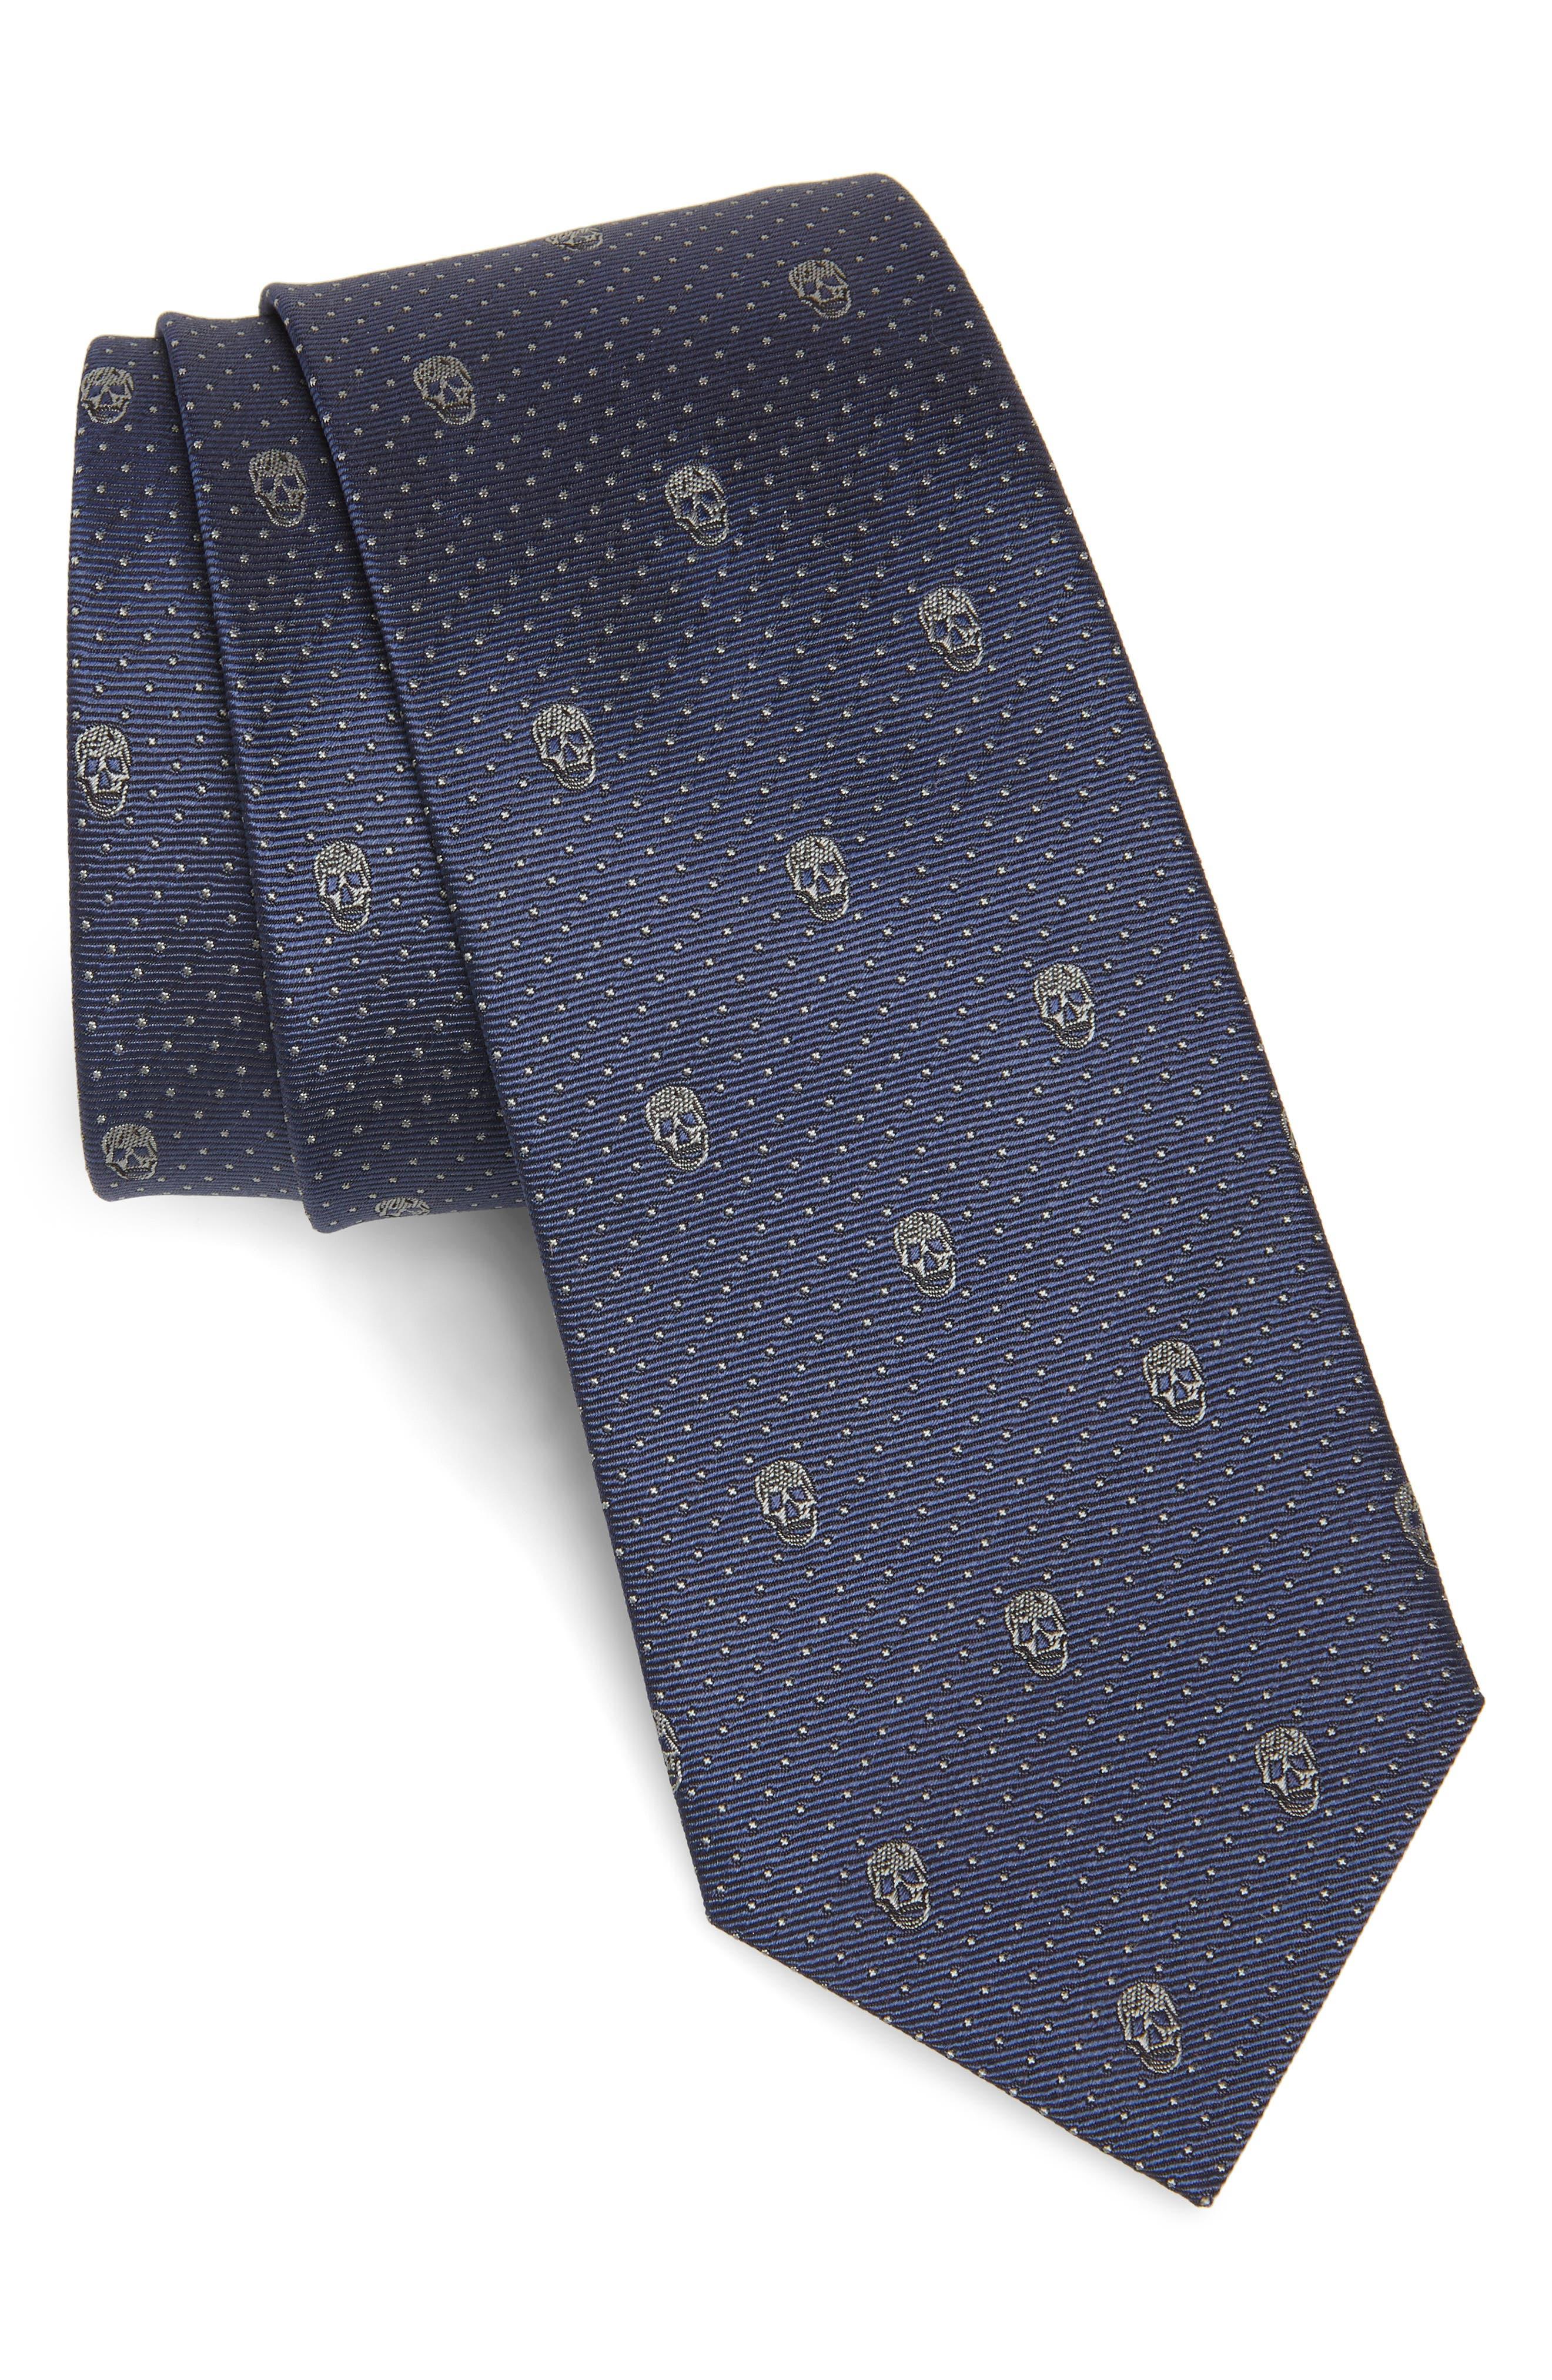 Skull Silk Tie,                             Main thumbnail 1, color,                             MIDNIGHT BLUE AND GREY